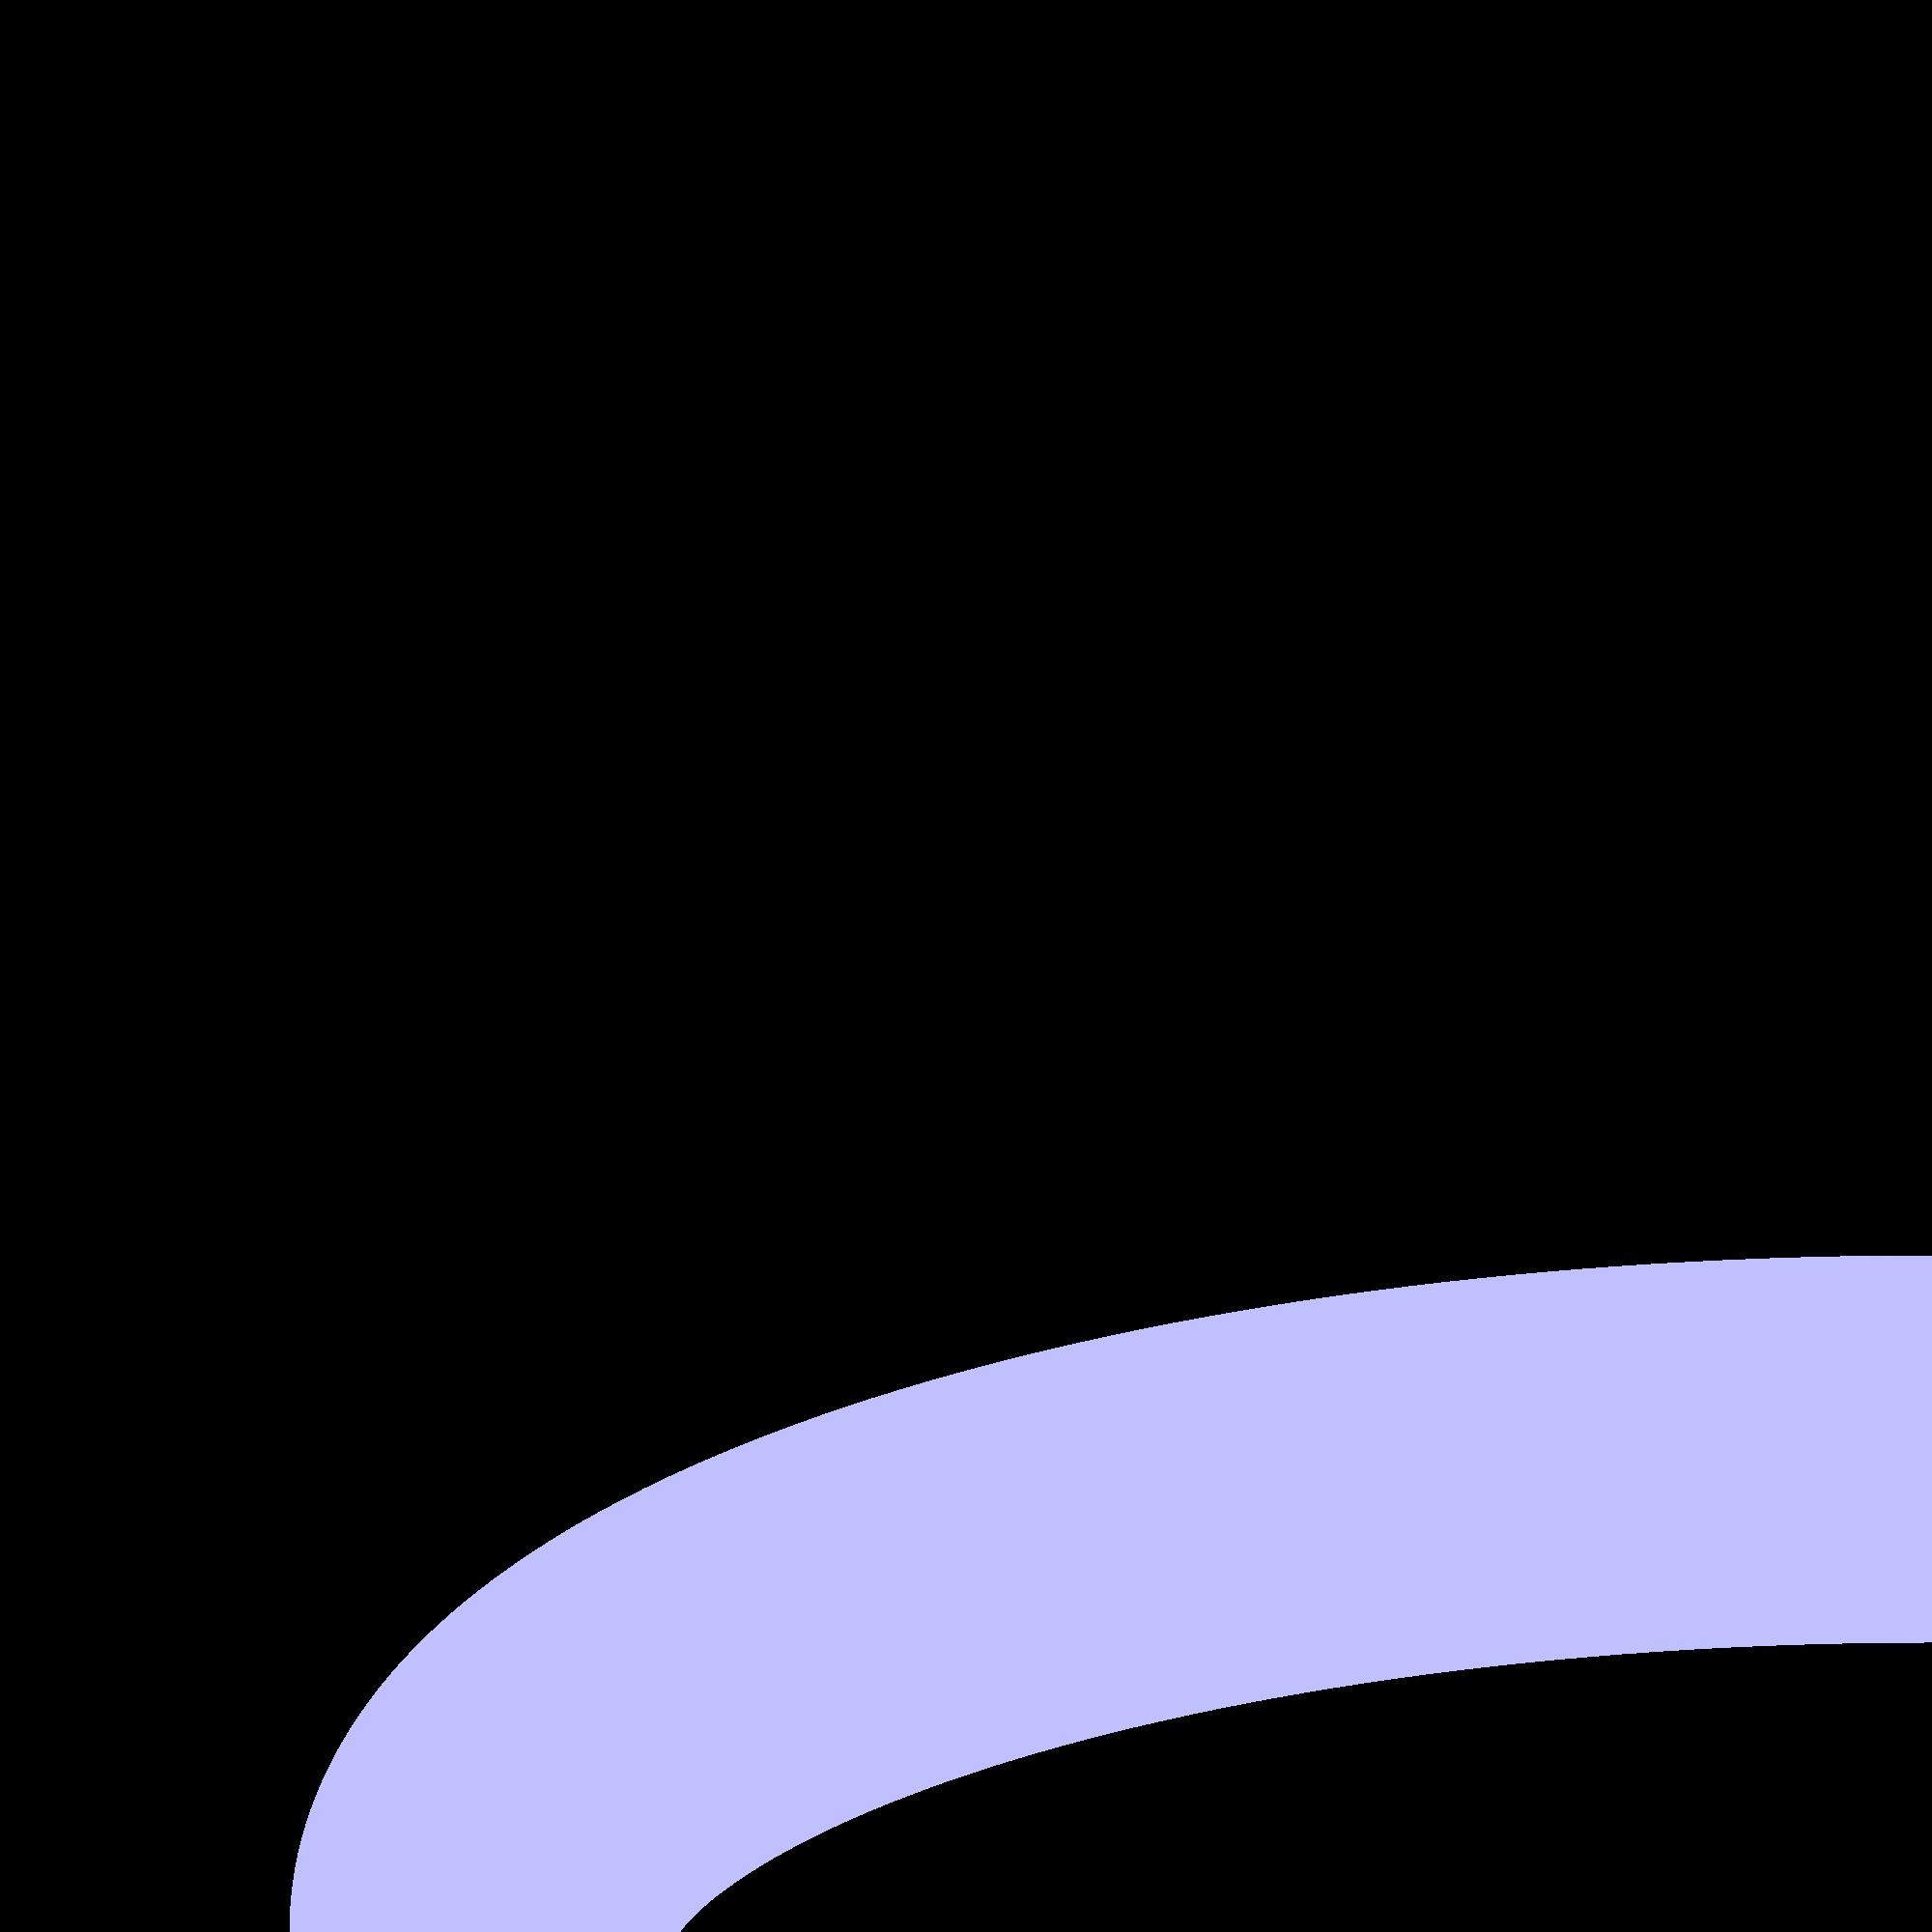 File bsicon exvstr lf. Lavender clipart svg